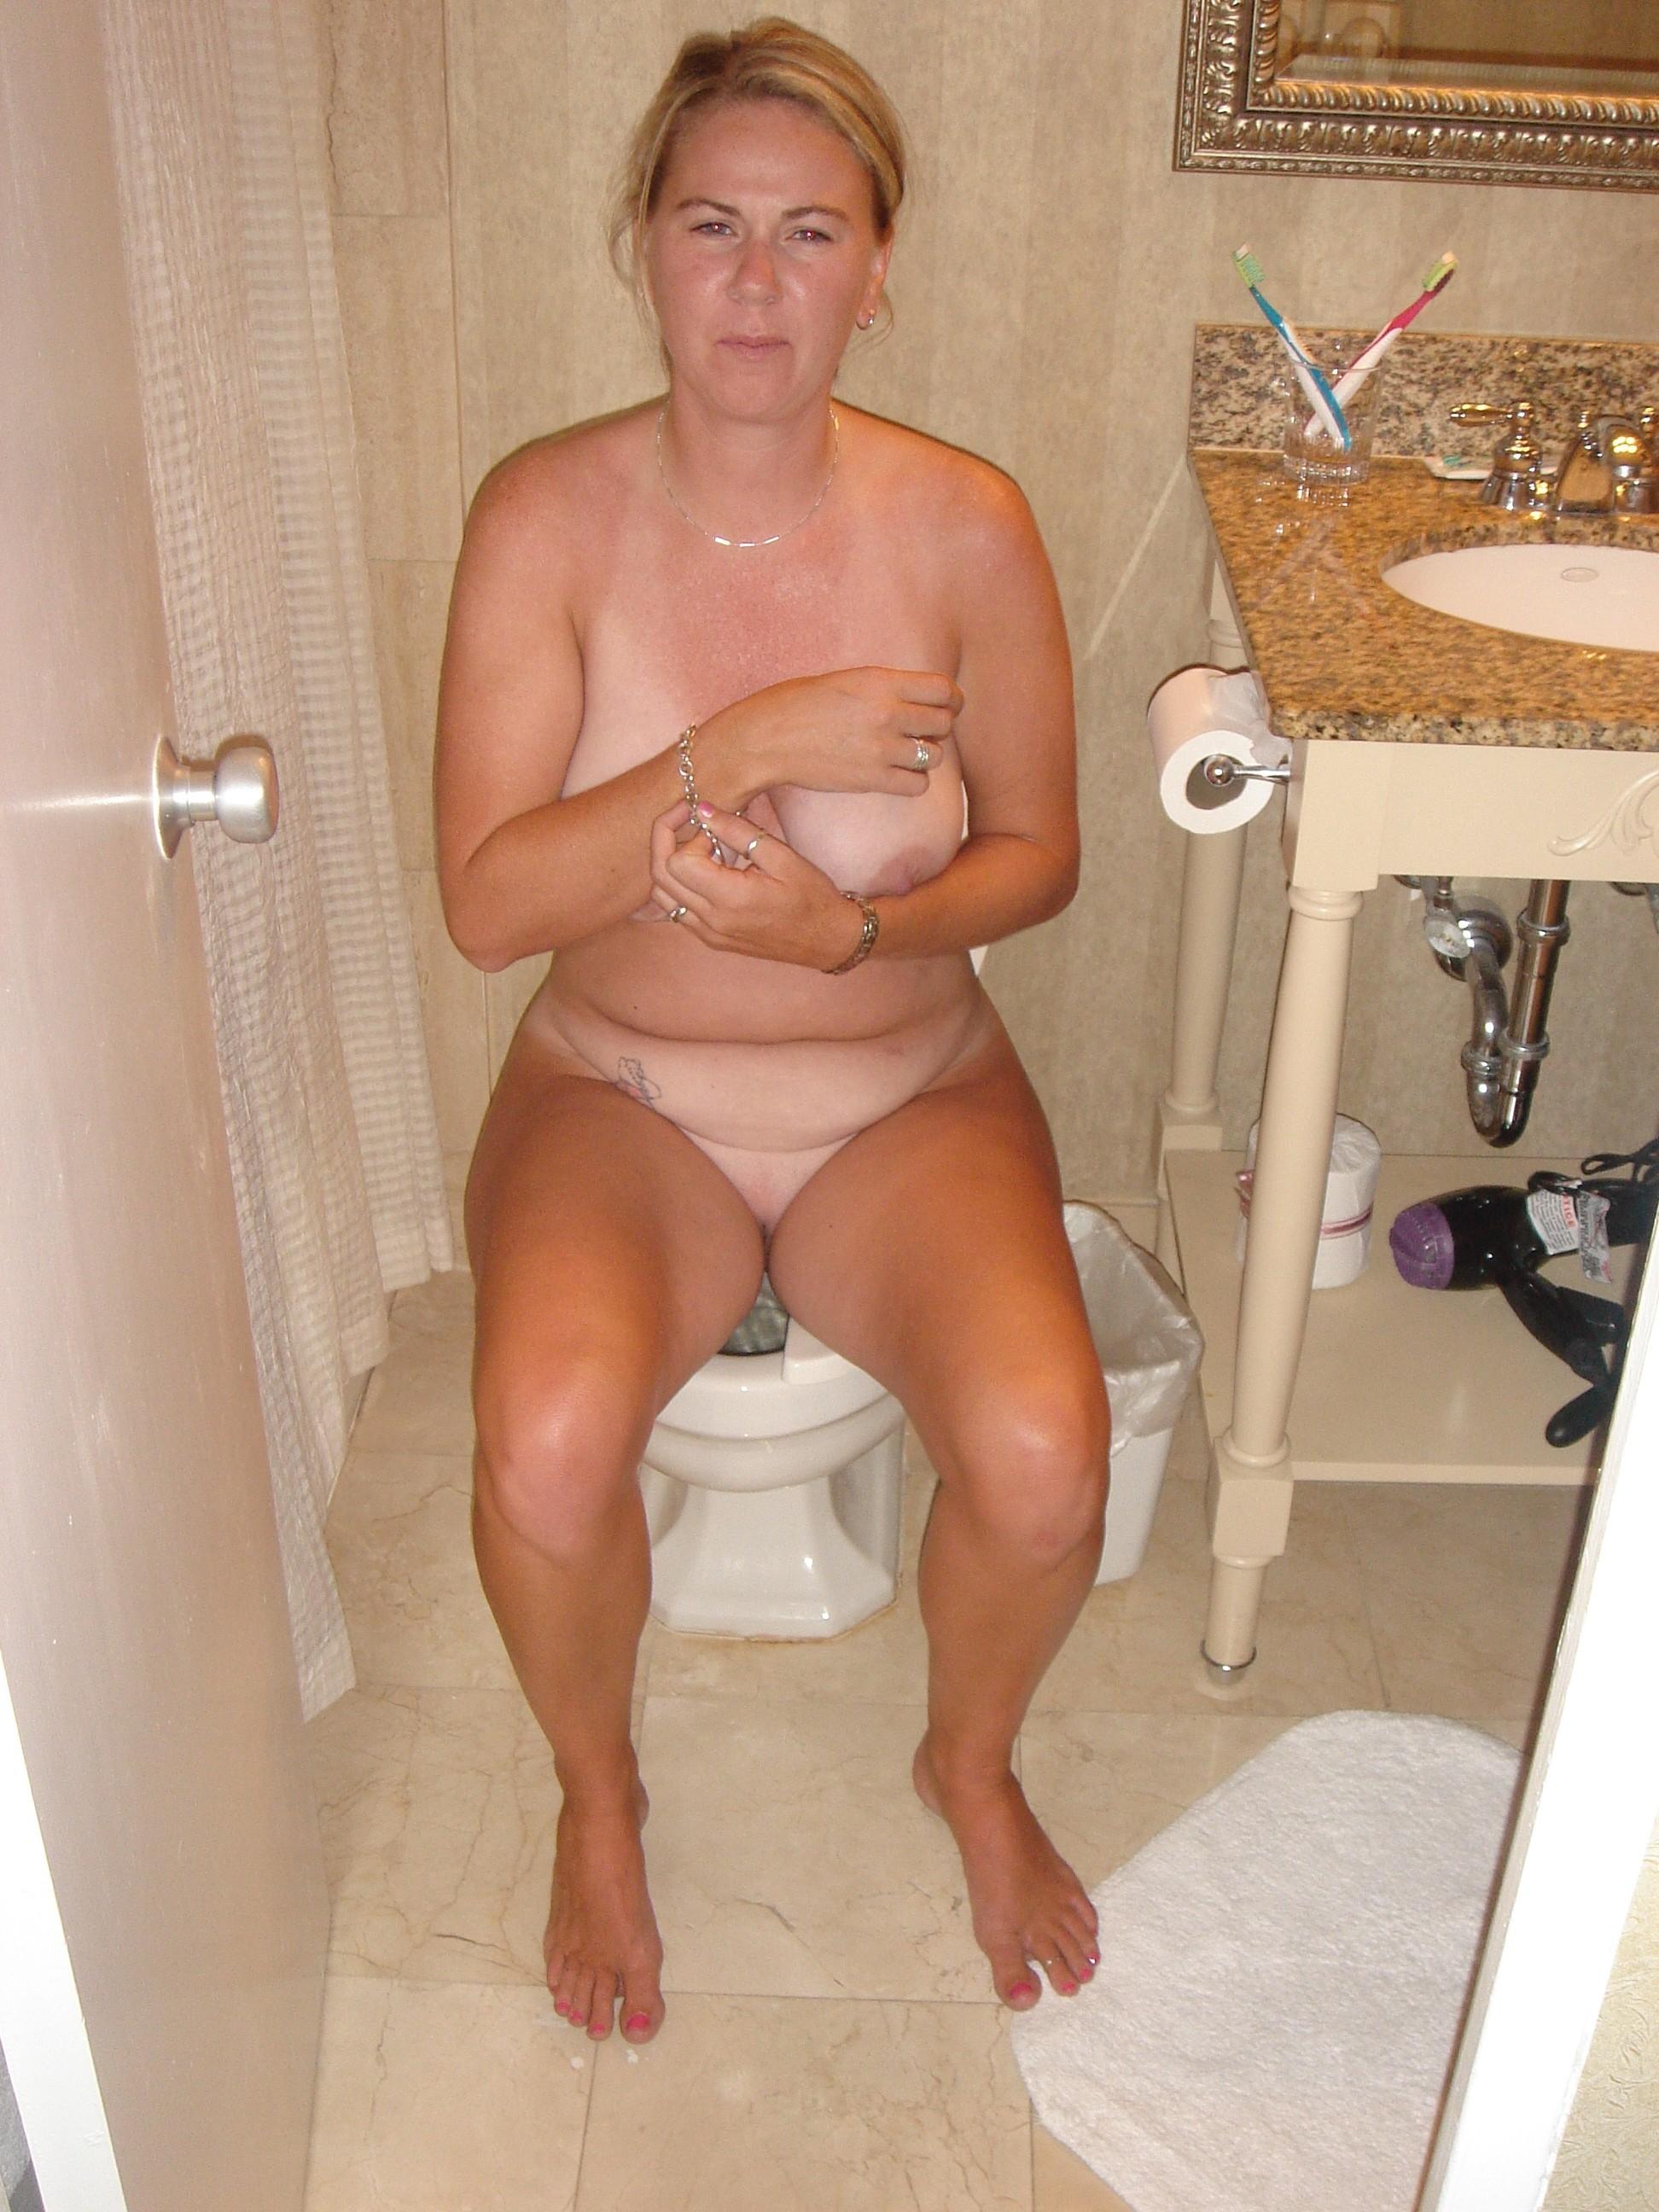 girls-moms-in-toilet-naked-hasidic-girls-hot